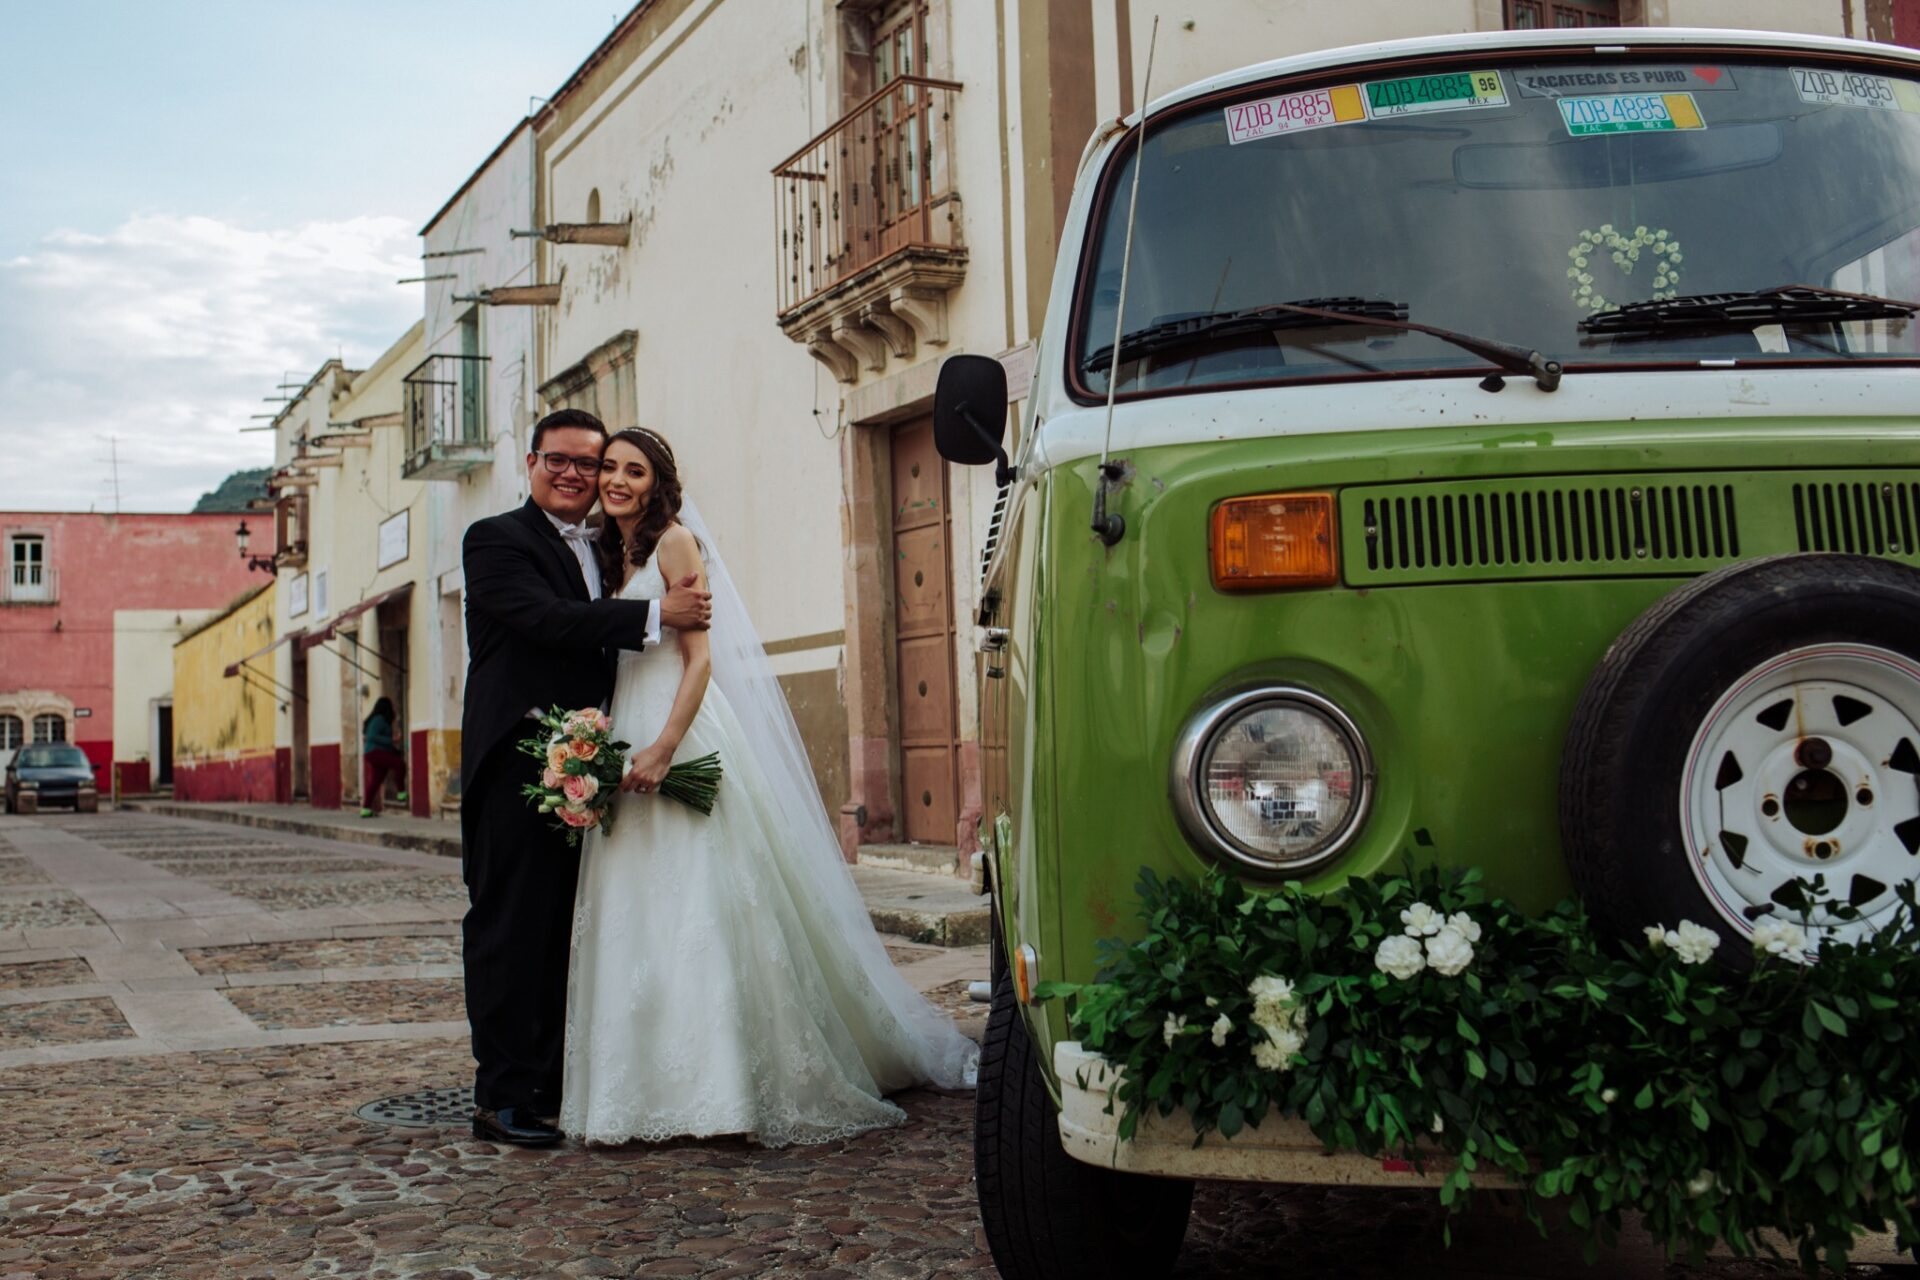 javier_noriega_fotografo_bodas_teul_zacatecas_wedding_photographer18a